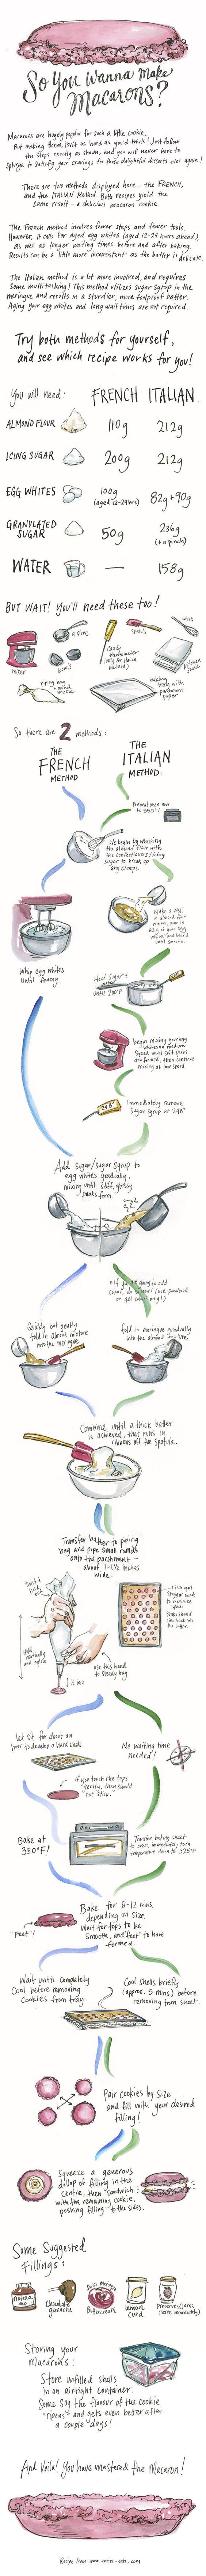 How to make macarons//: